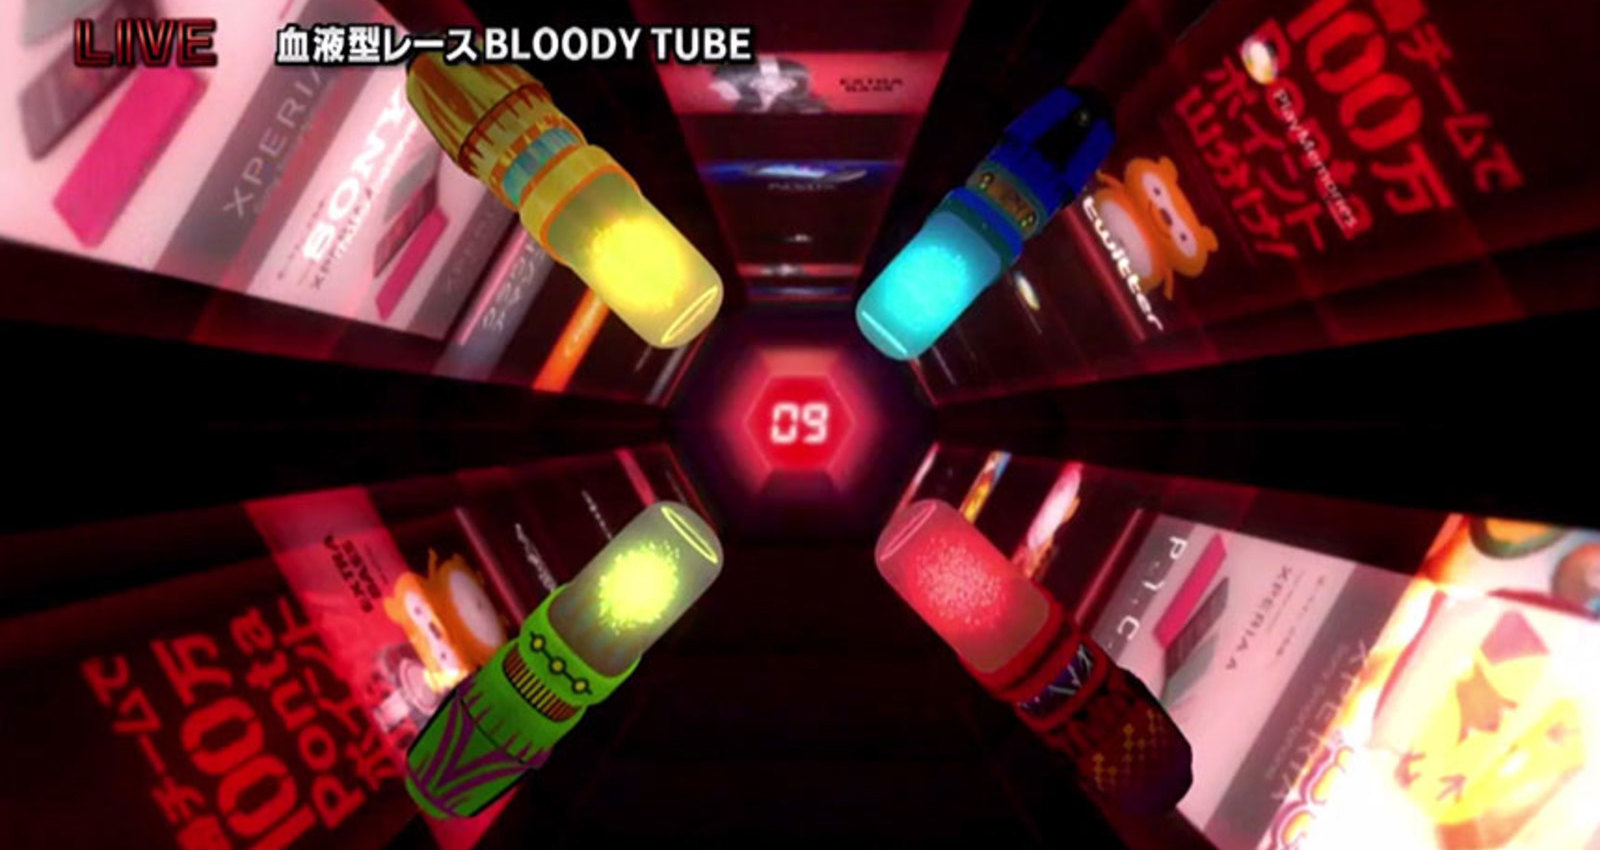 Bloody Tube